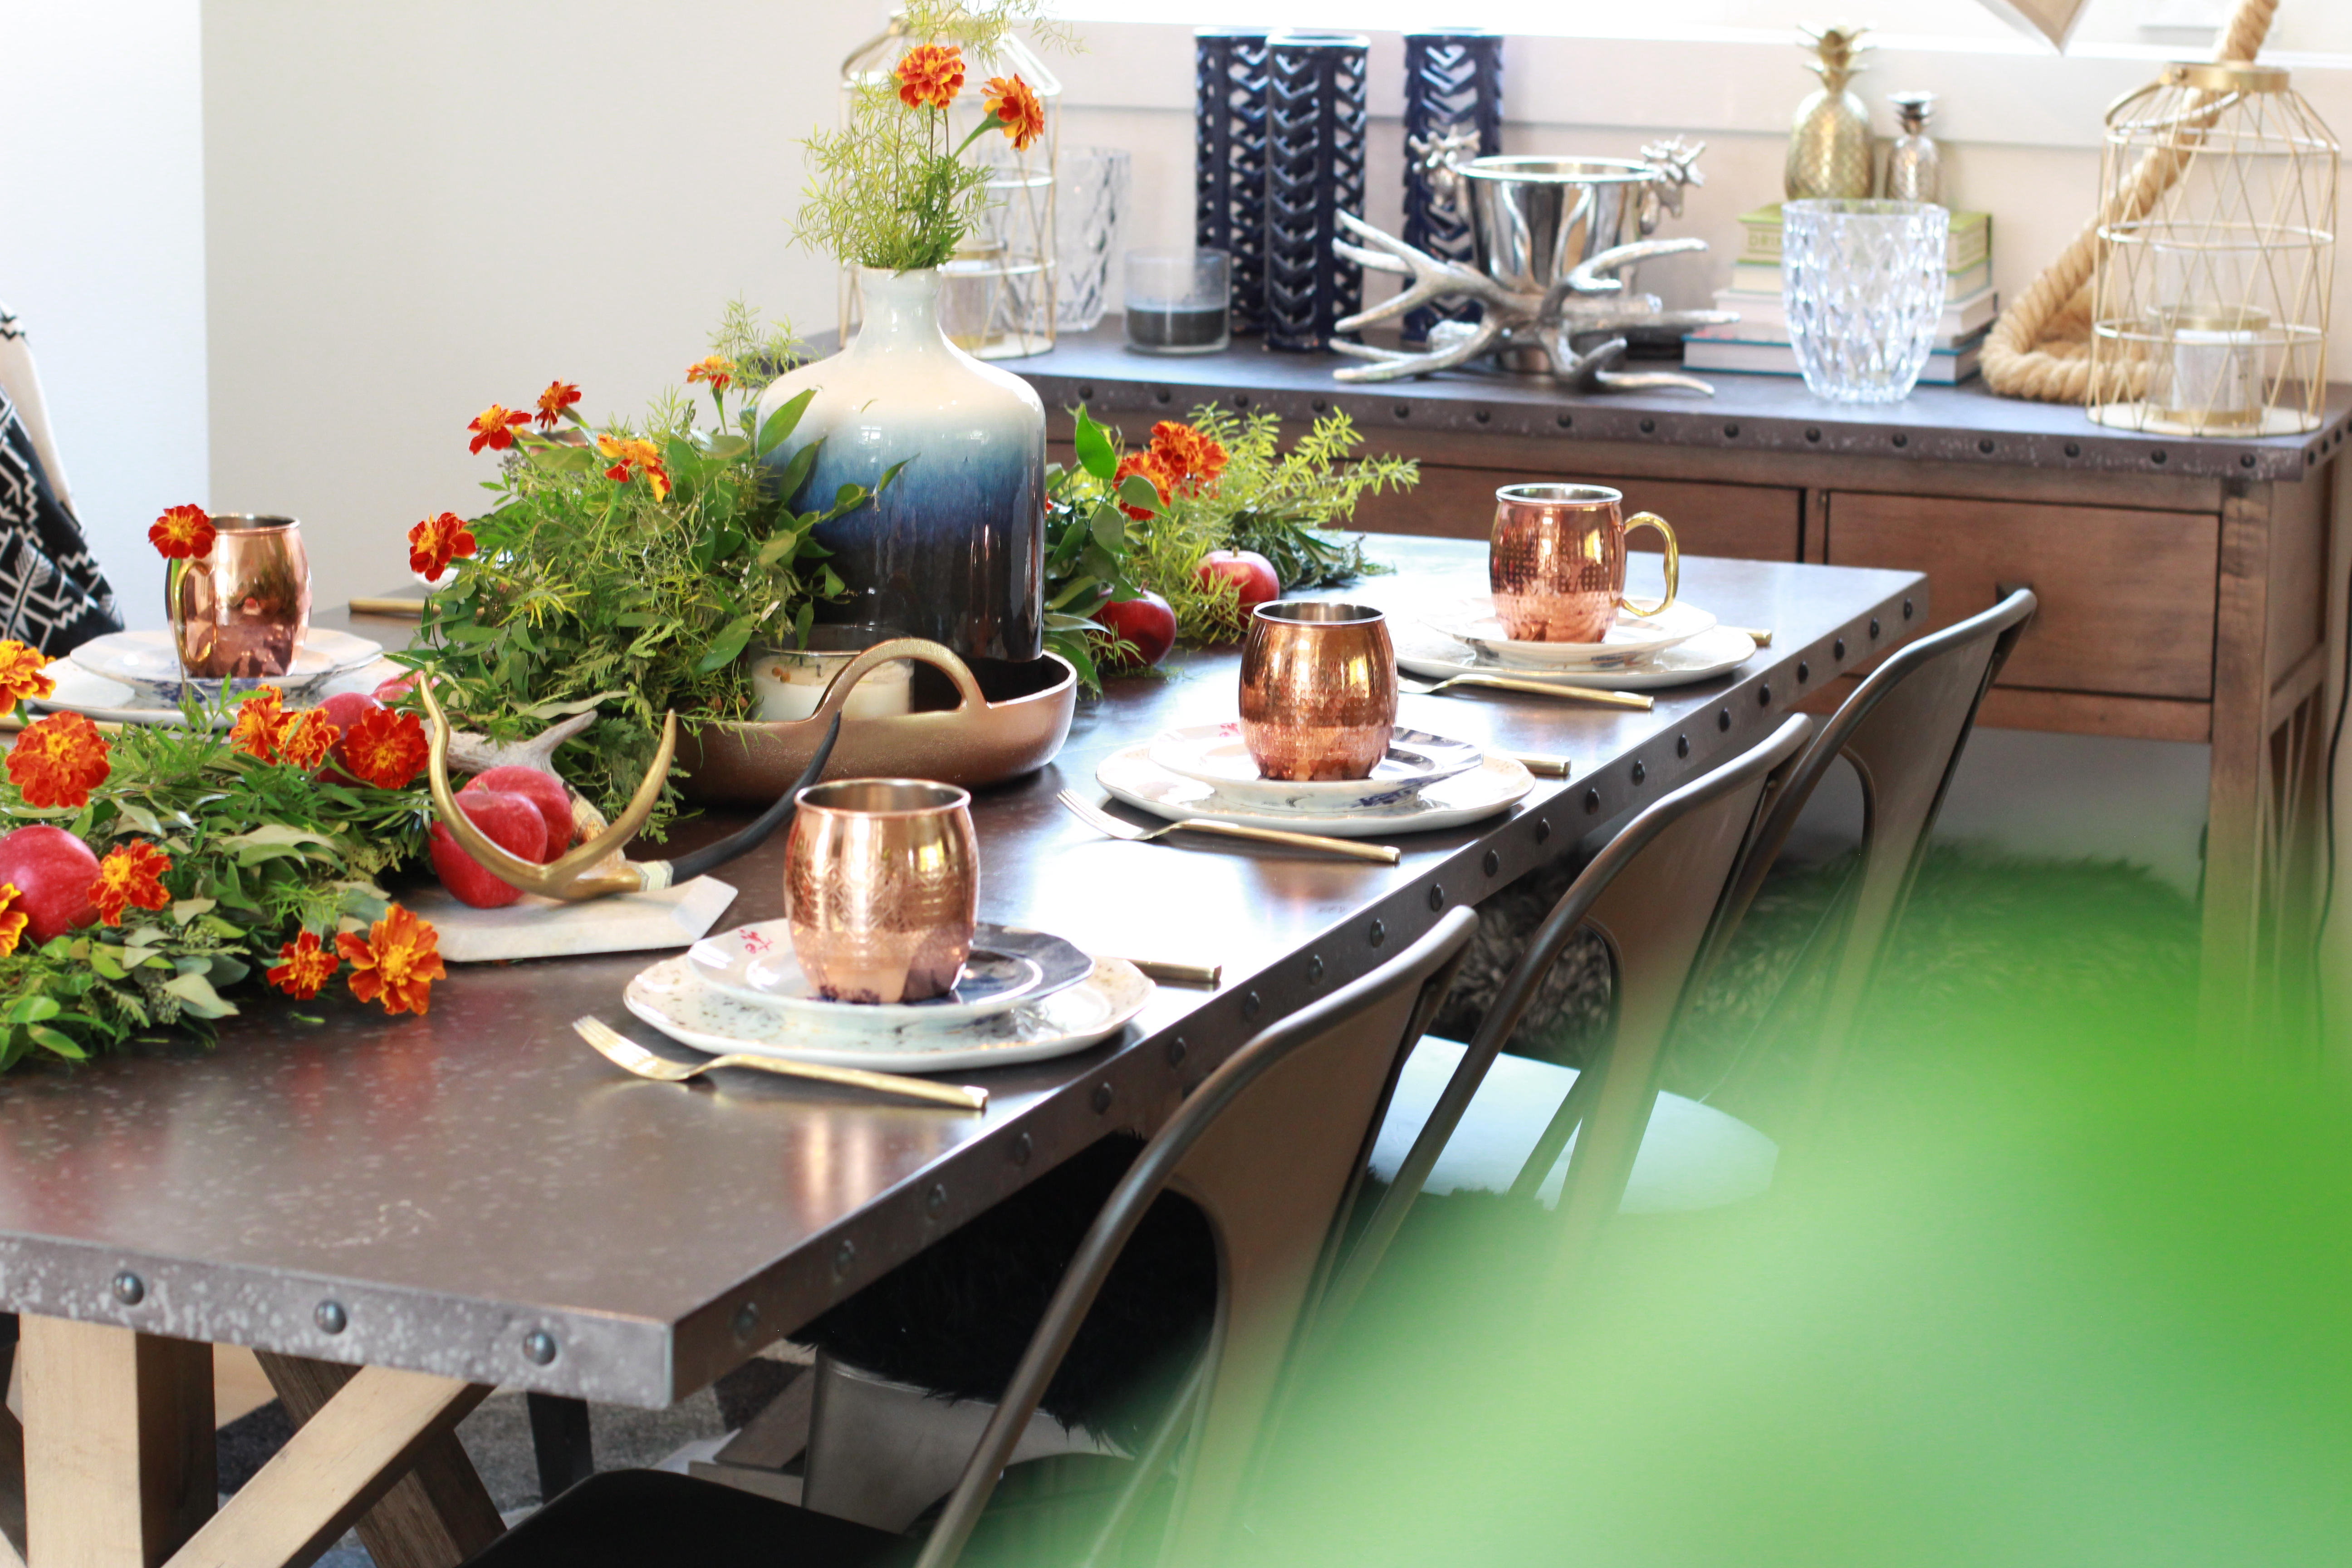 fall table setting tablescape home decor style apples & Home Decor #AD || All those Fall feelsu2026 || An Autumn Table Setting ...